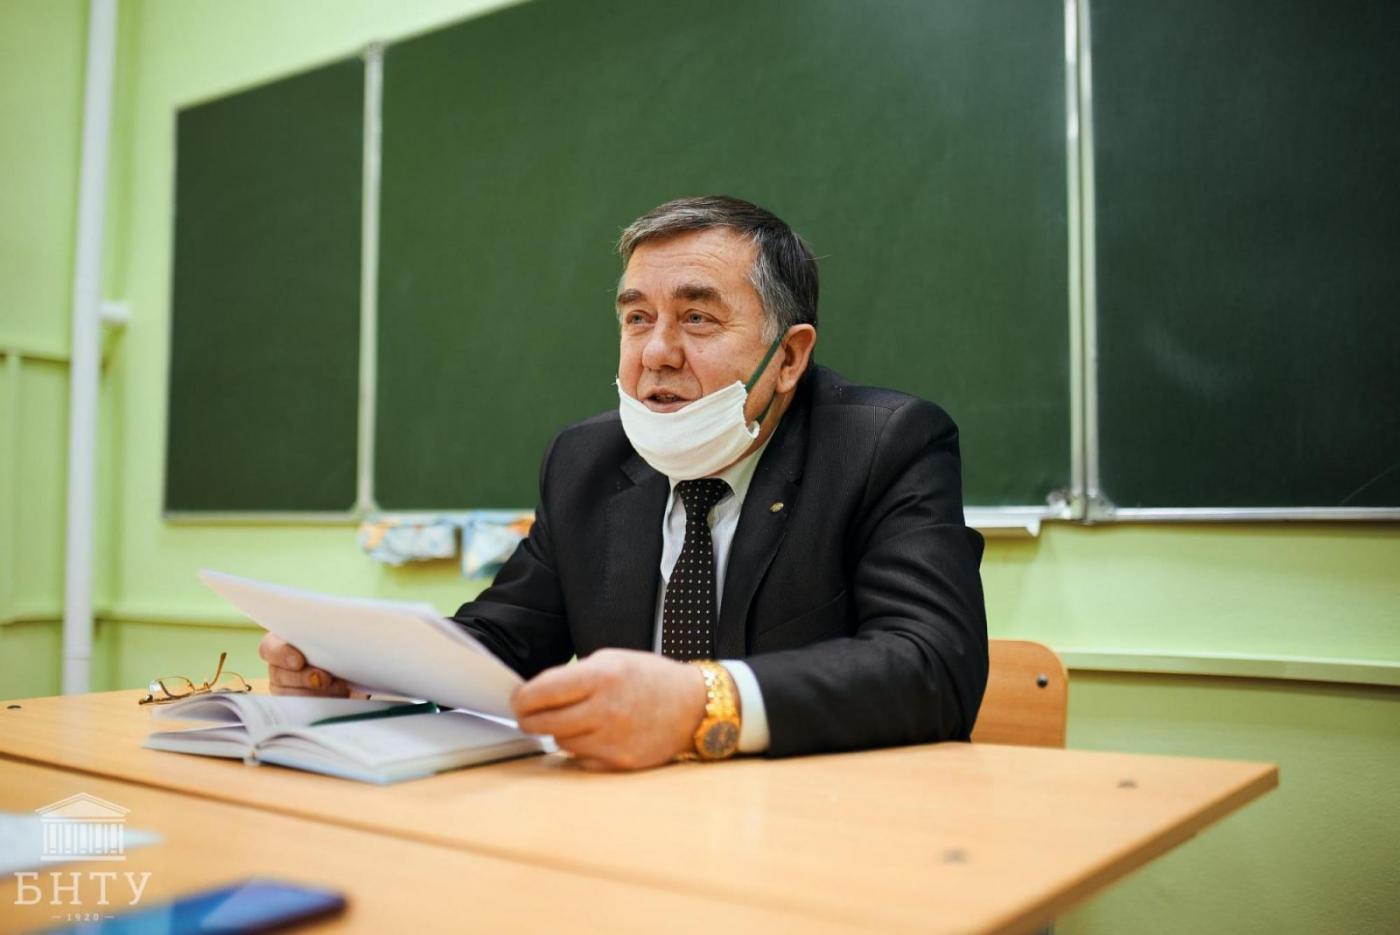 Университет в лицах: Басалай Григорий Антонович